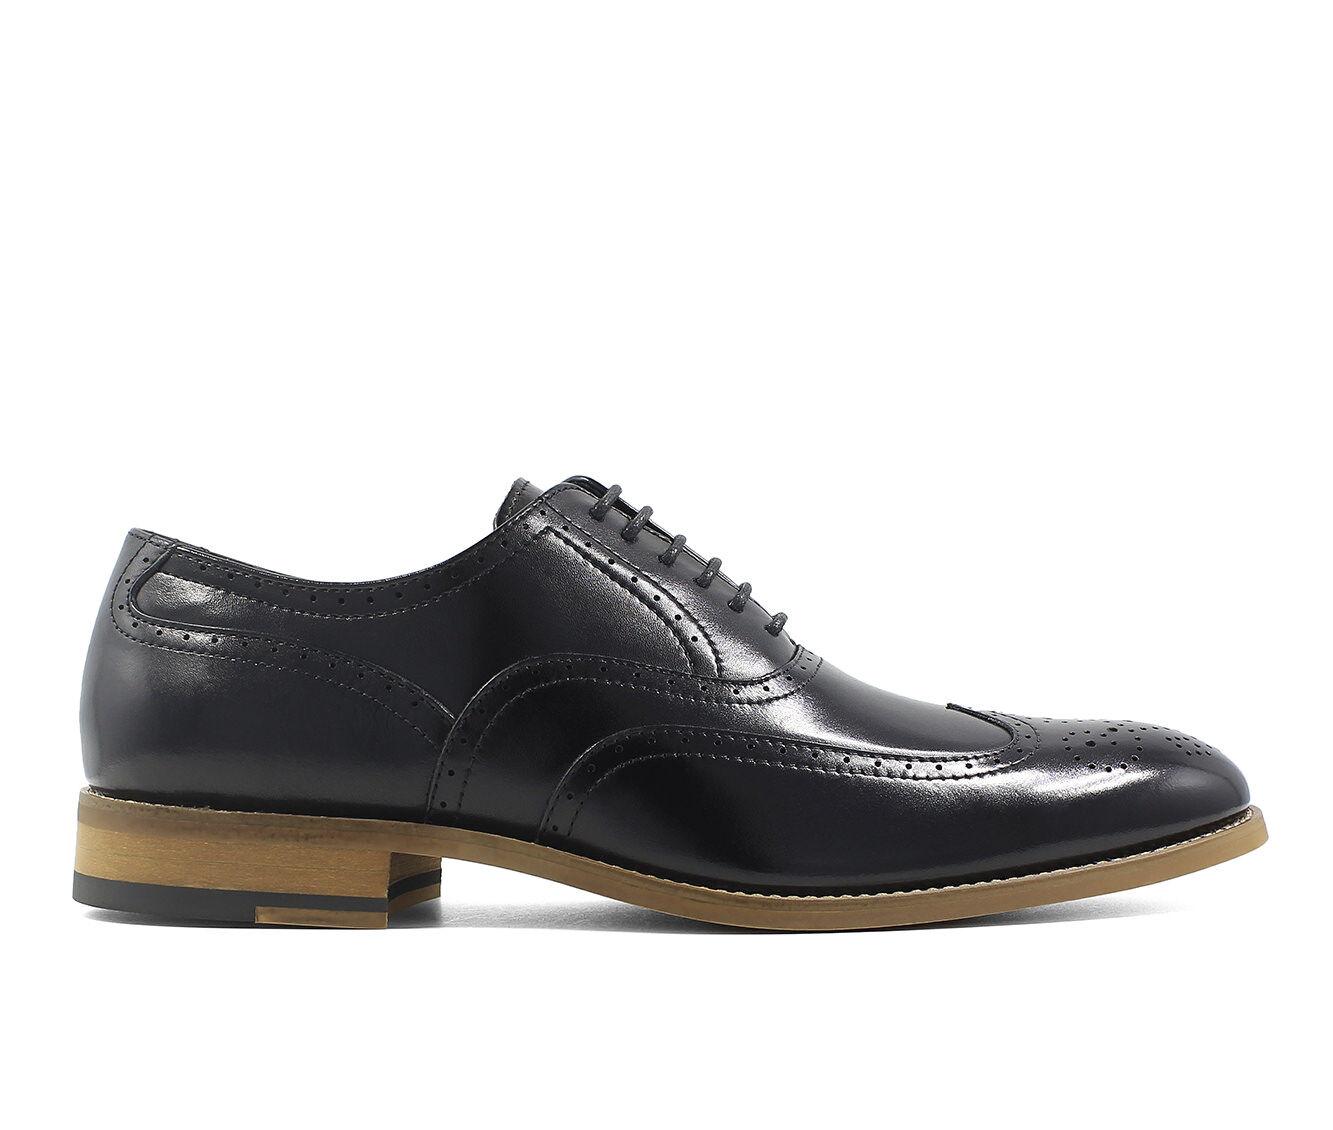 Promotional Men's Stacy Adams Dunbar Wingtip Wing Tip Dress Shoes Black